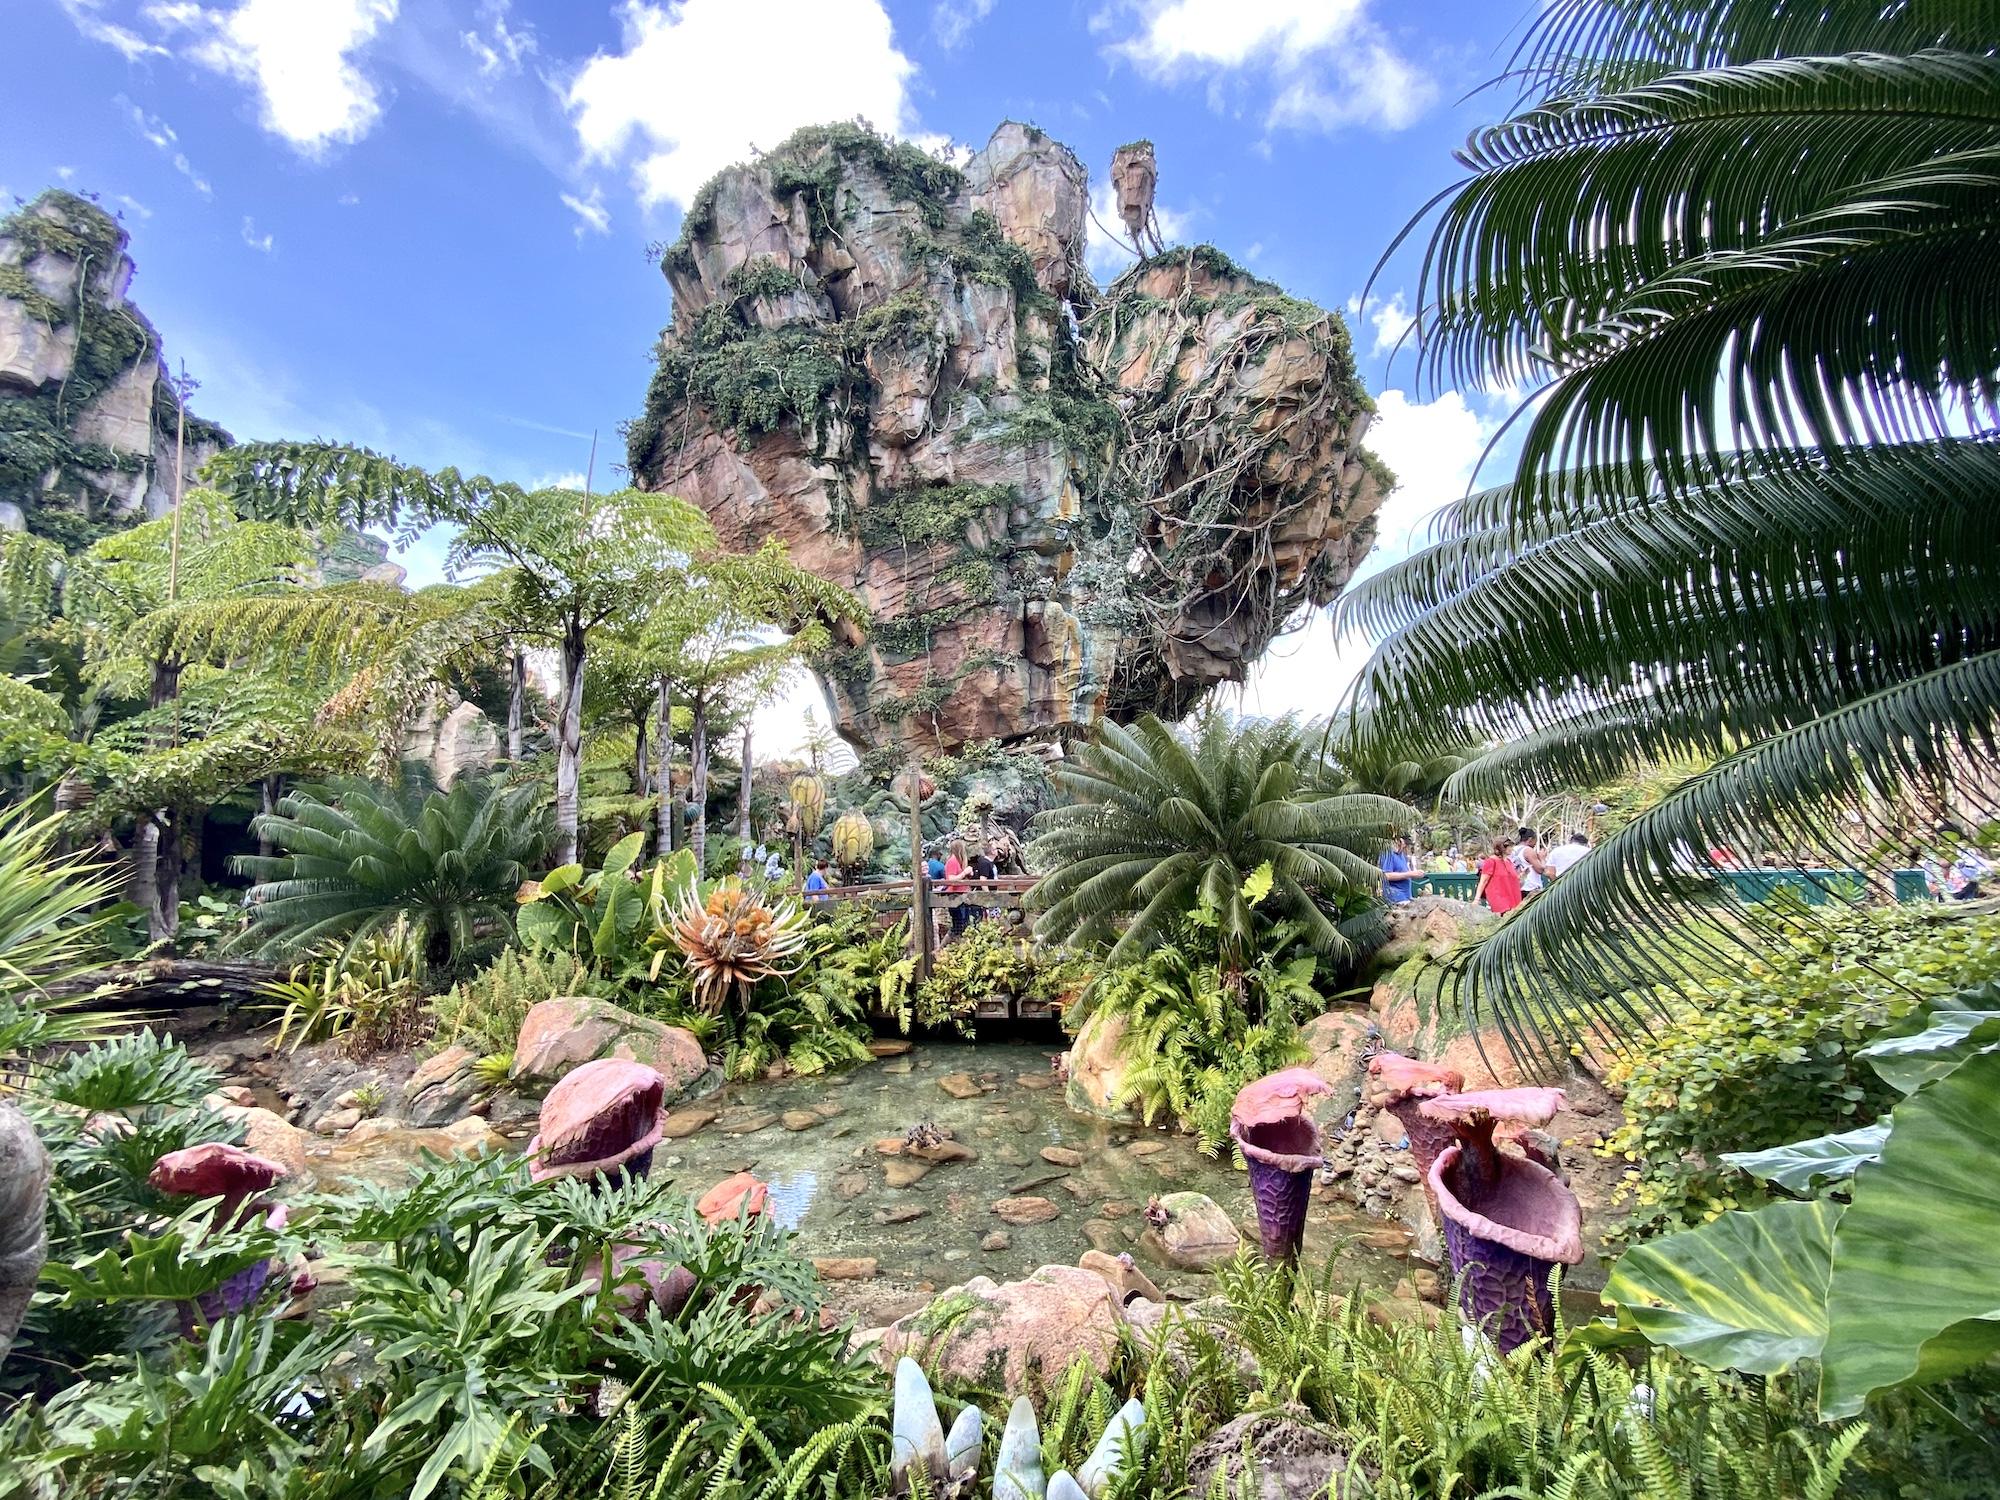 Pandora The World of the Avatar